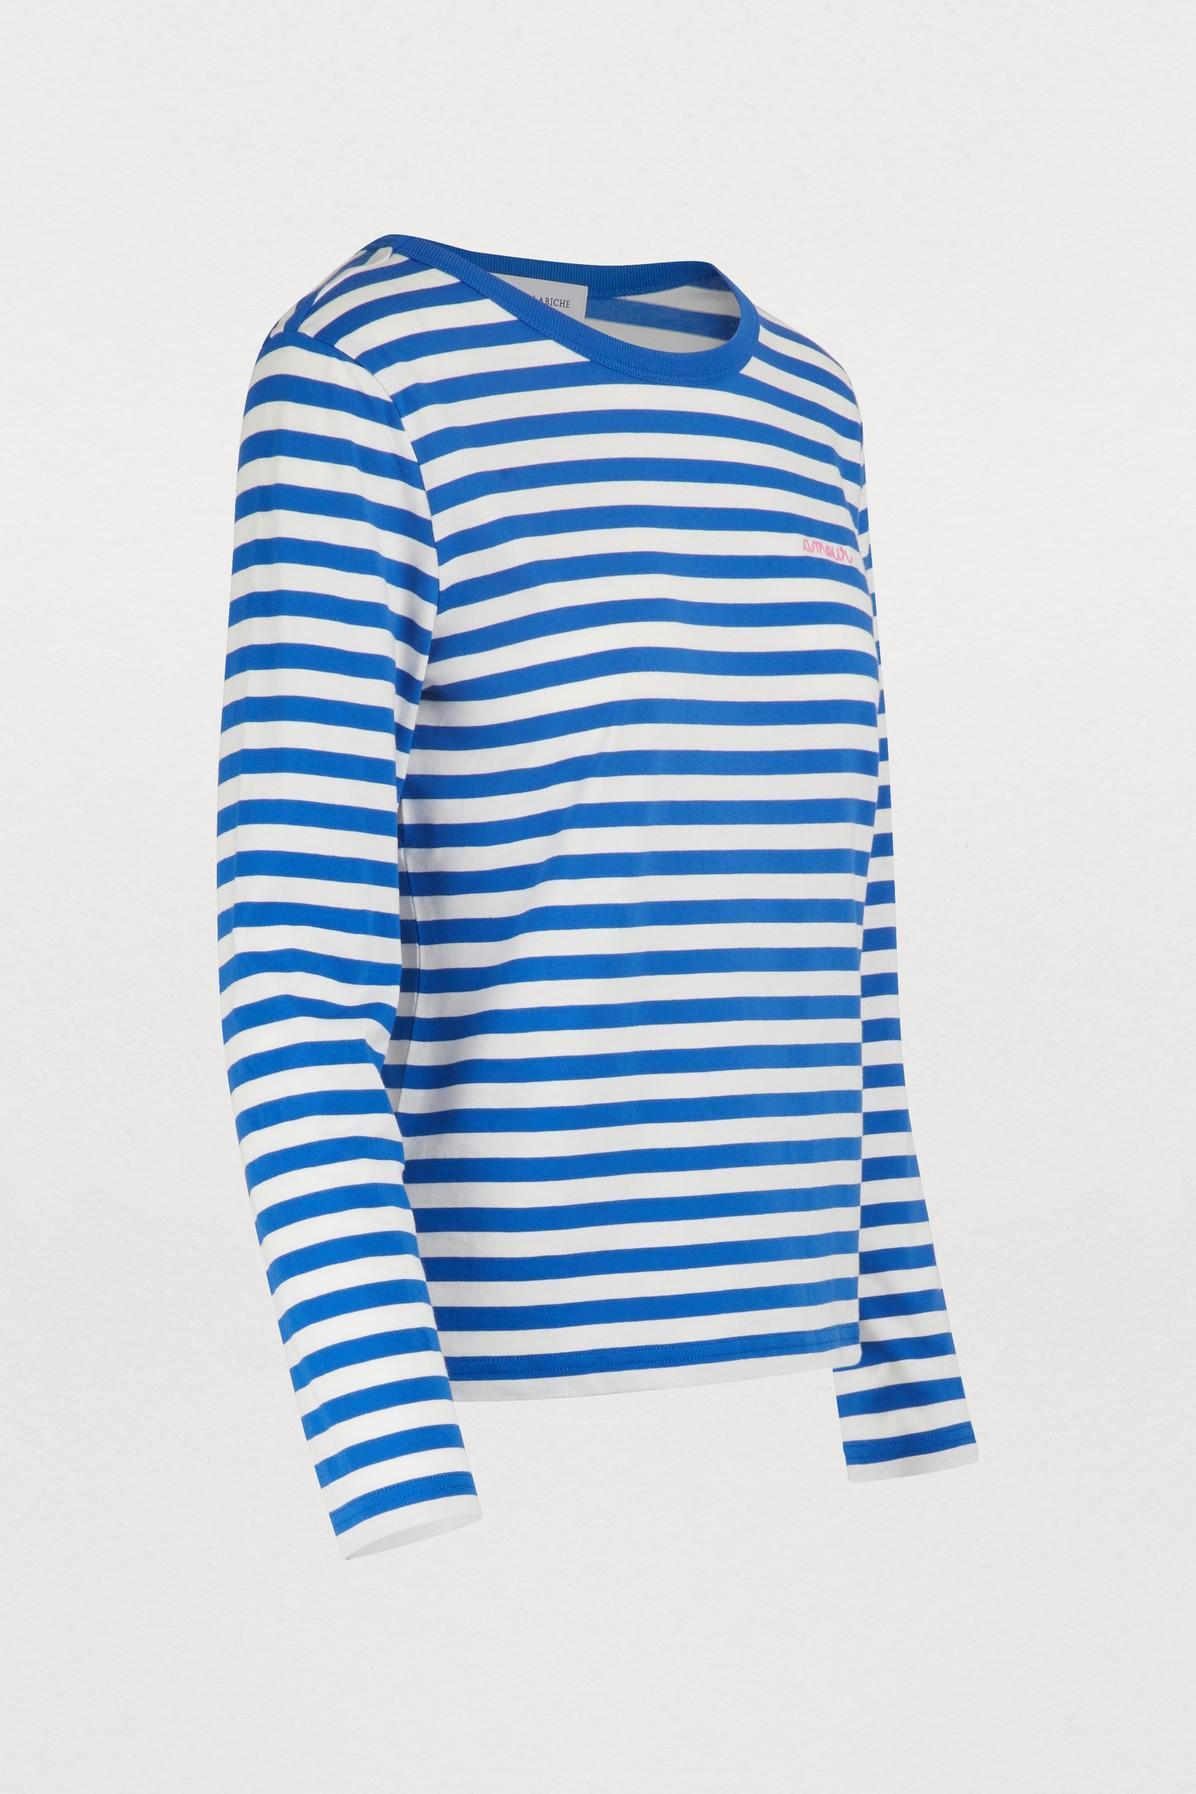 57b1a93727 Maison Labiche - Blue Amour Striped T-shirt - Lyst. View fullscreen